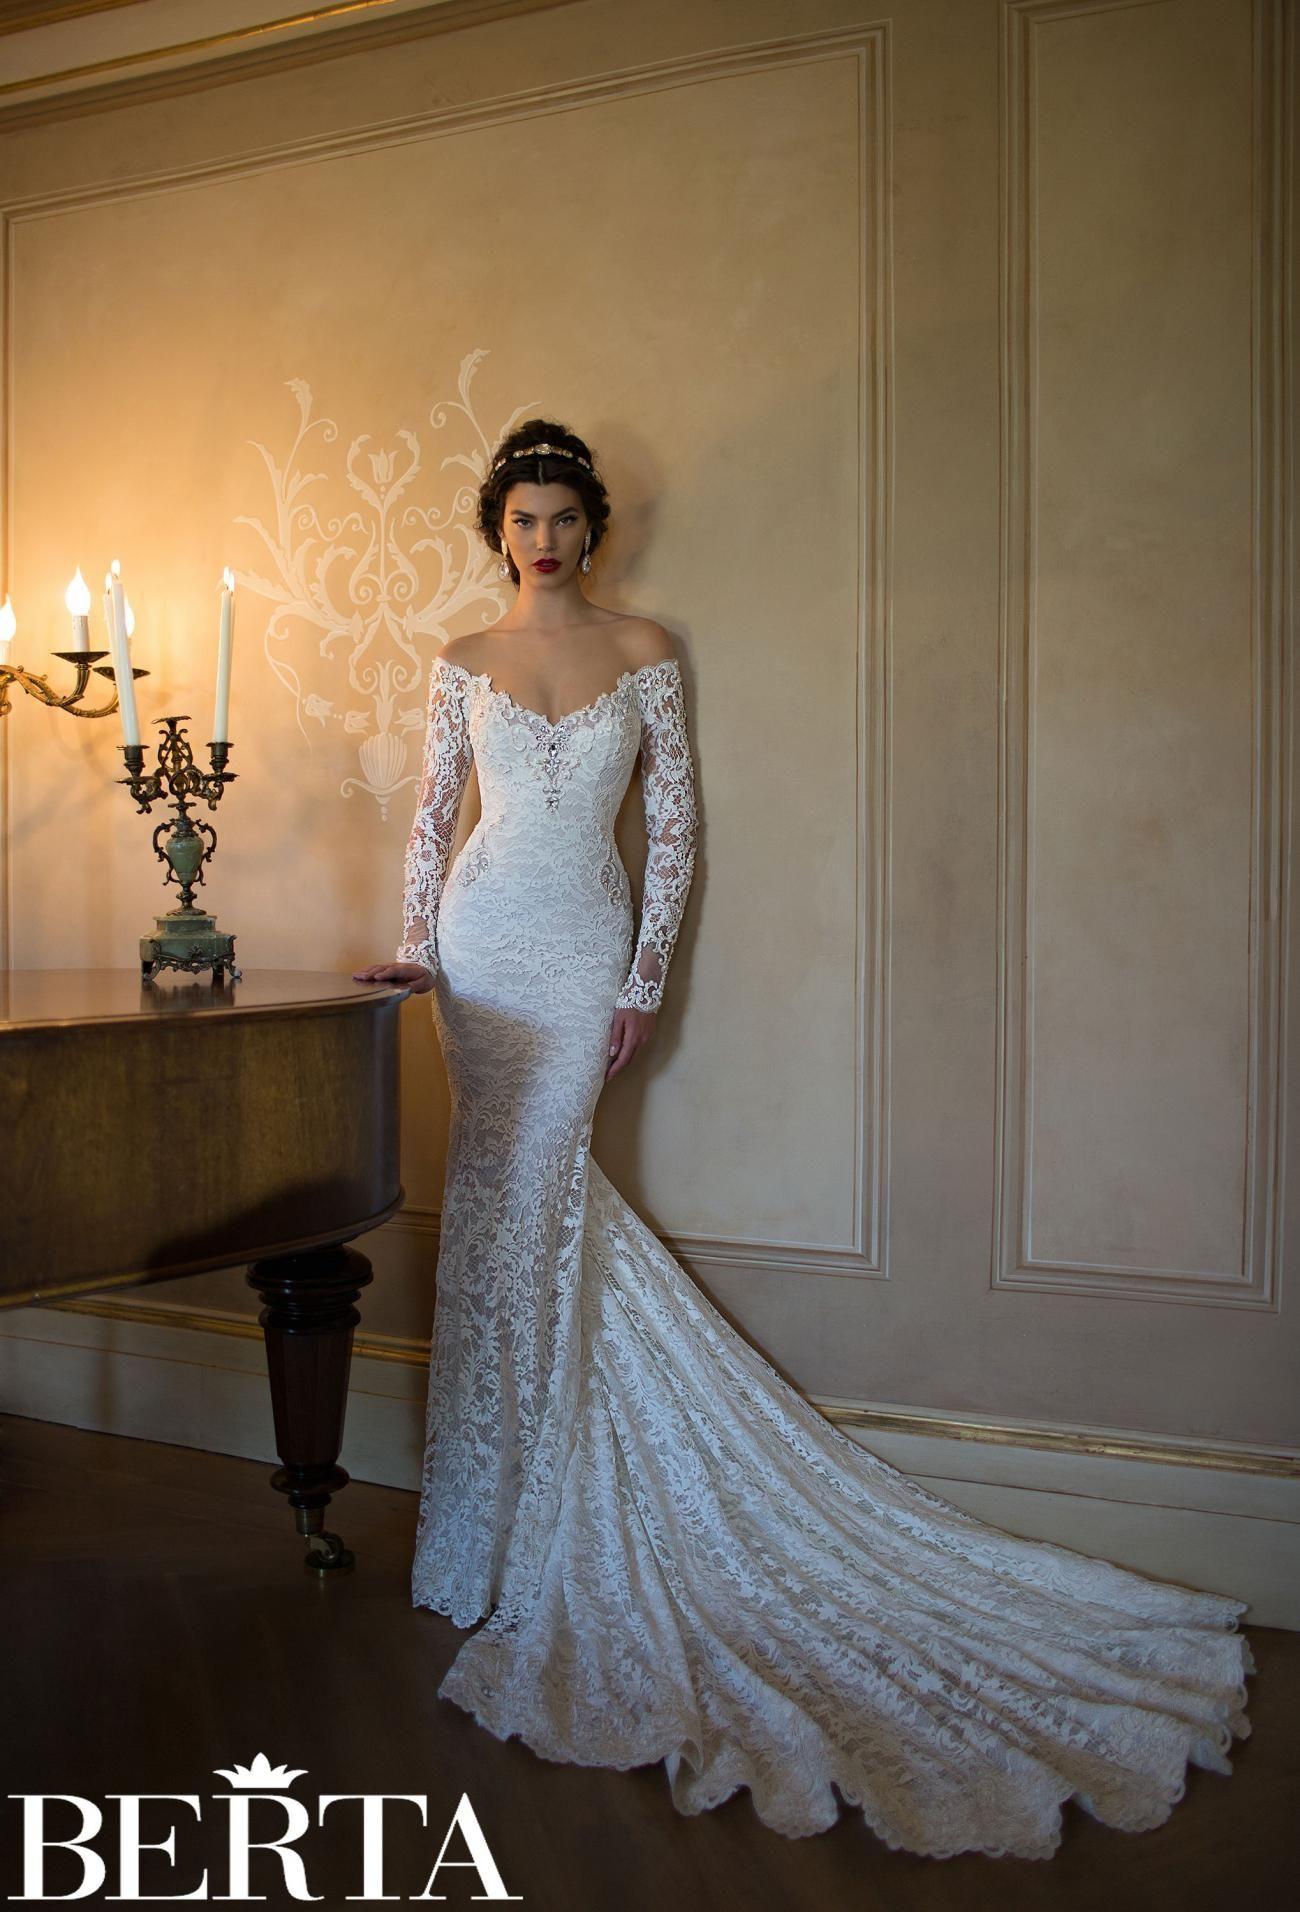 Royal Blue Slim Fit Mermaid Long Train Prom Dress Wedding Dresses Wedding Dress Sleeves Dream Wedding Dresses [ 1912 x 1300 Pixel ]